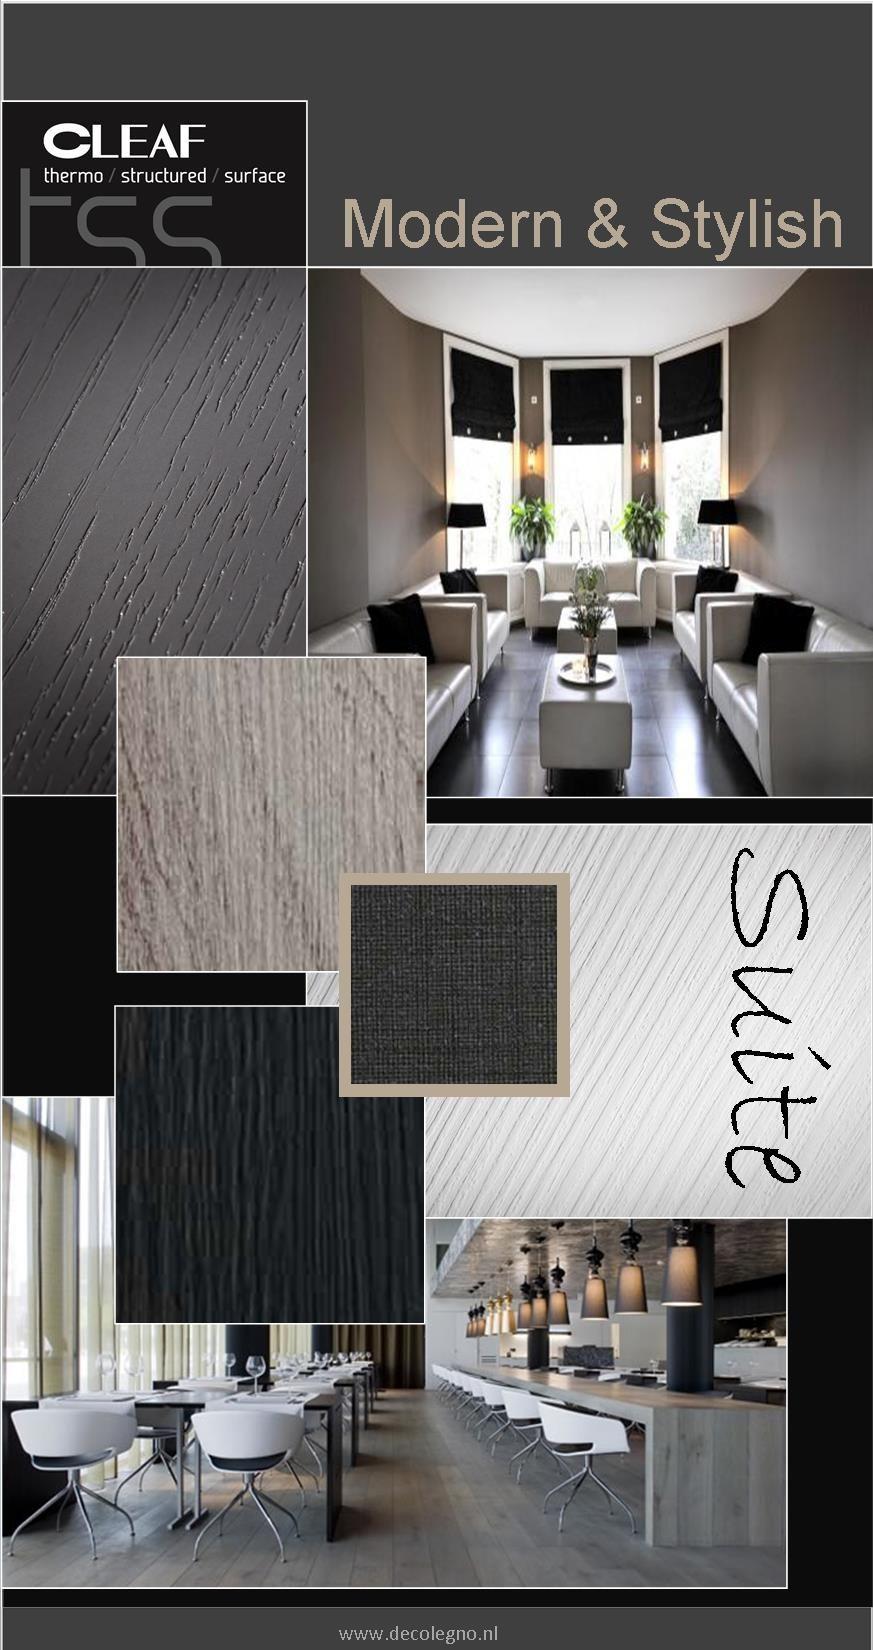 VRI interieur moodboard Decolegno modern & stylish | Mood Board ...